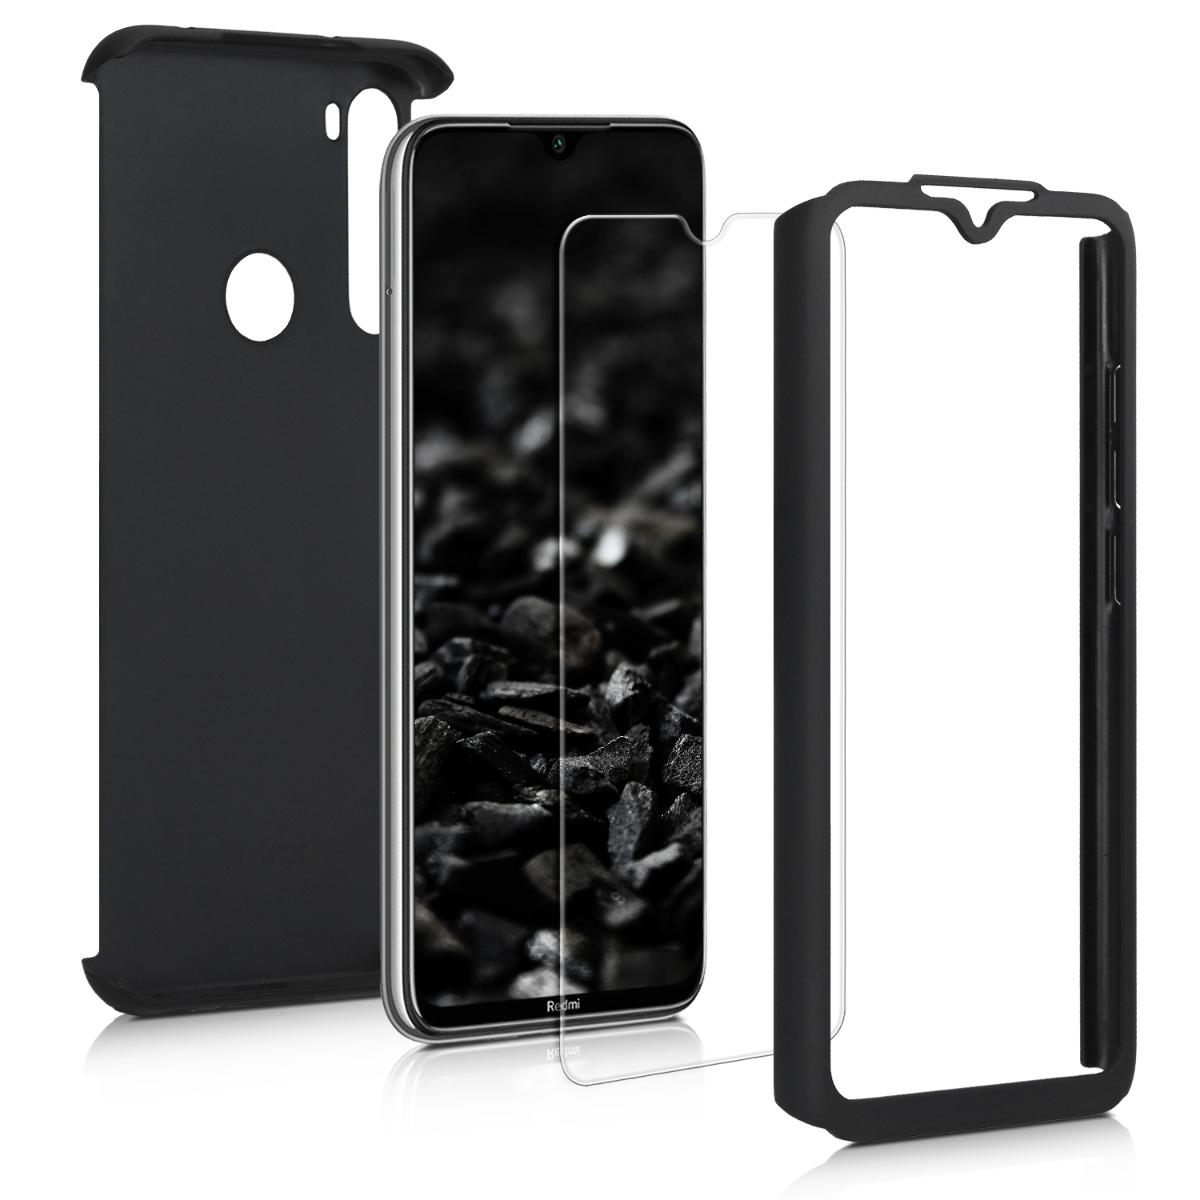 KW Θήκη Full Body Xiaomi Redmi Note 8 & Tempered Glass - Metallic Black (50191.68)